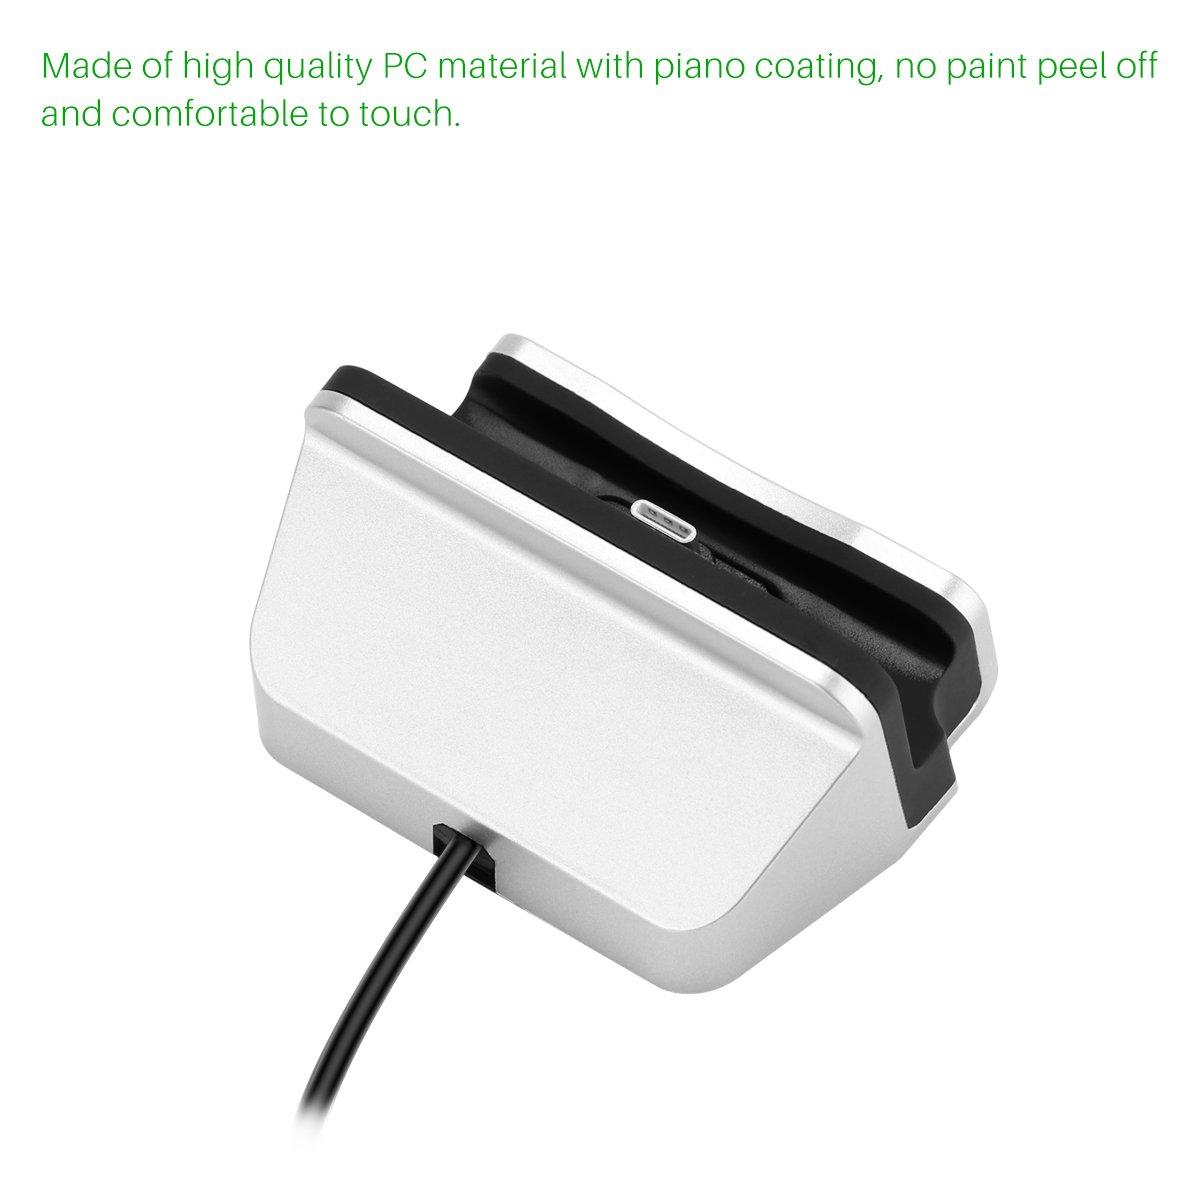 Nexus 5X 6P Leeco Le Max 2 // Le 2 Pro Sunsbell USB Type-C Desktop Charging Dock USB-C Charger Stand con cavo per Samsung Galaxy S8 // S8 Inoltre ecc